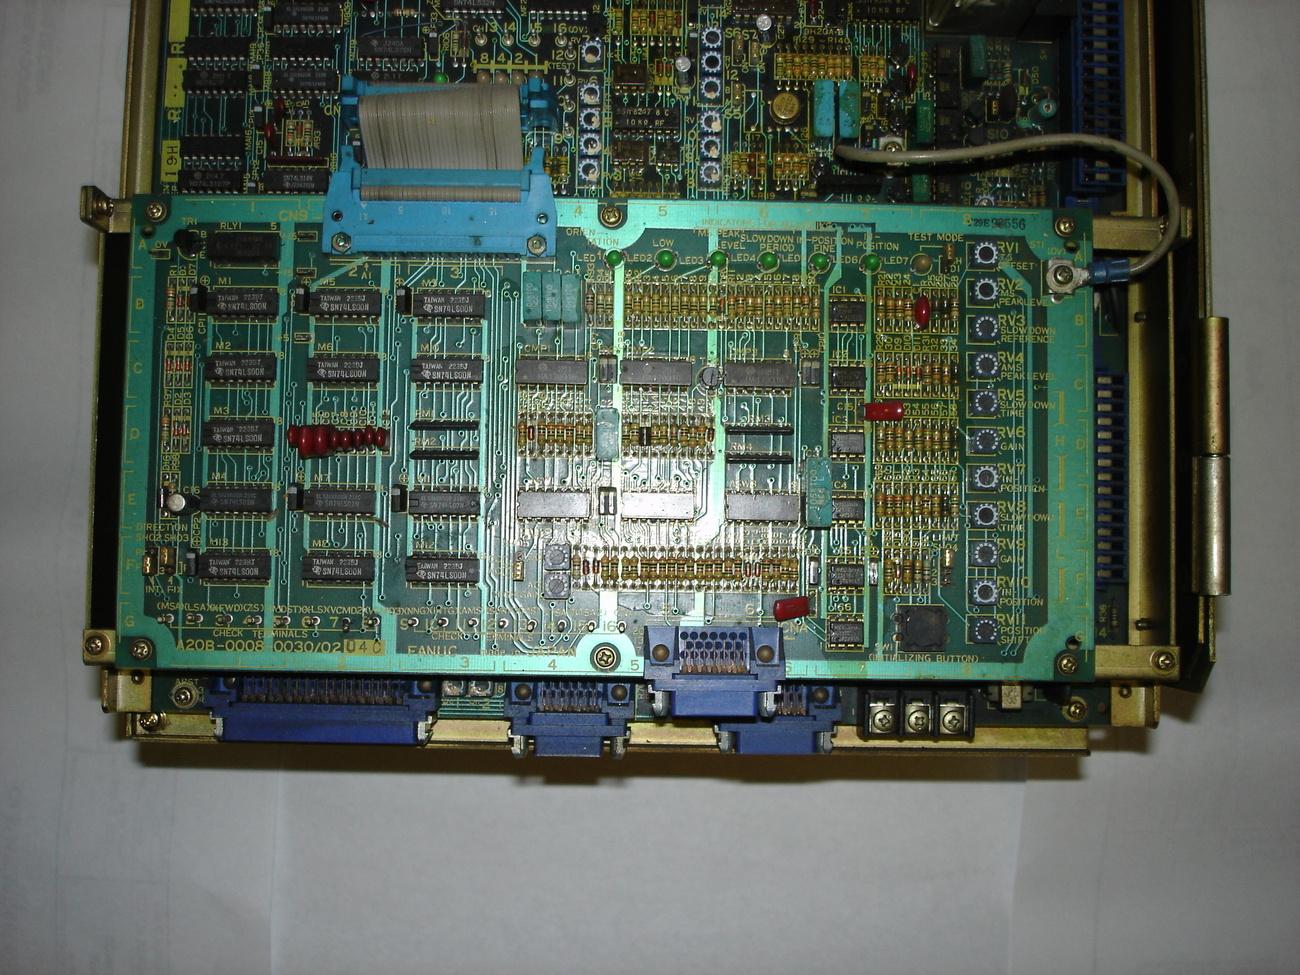 Fanuc Spindle Amp AC SP-3, A06B-6044-H007 image 2